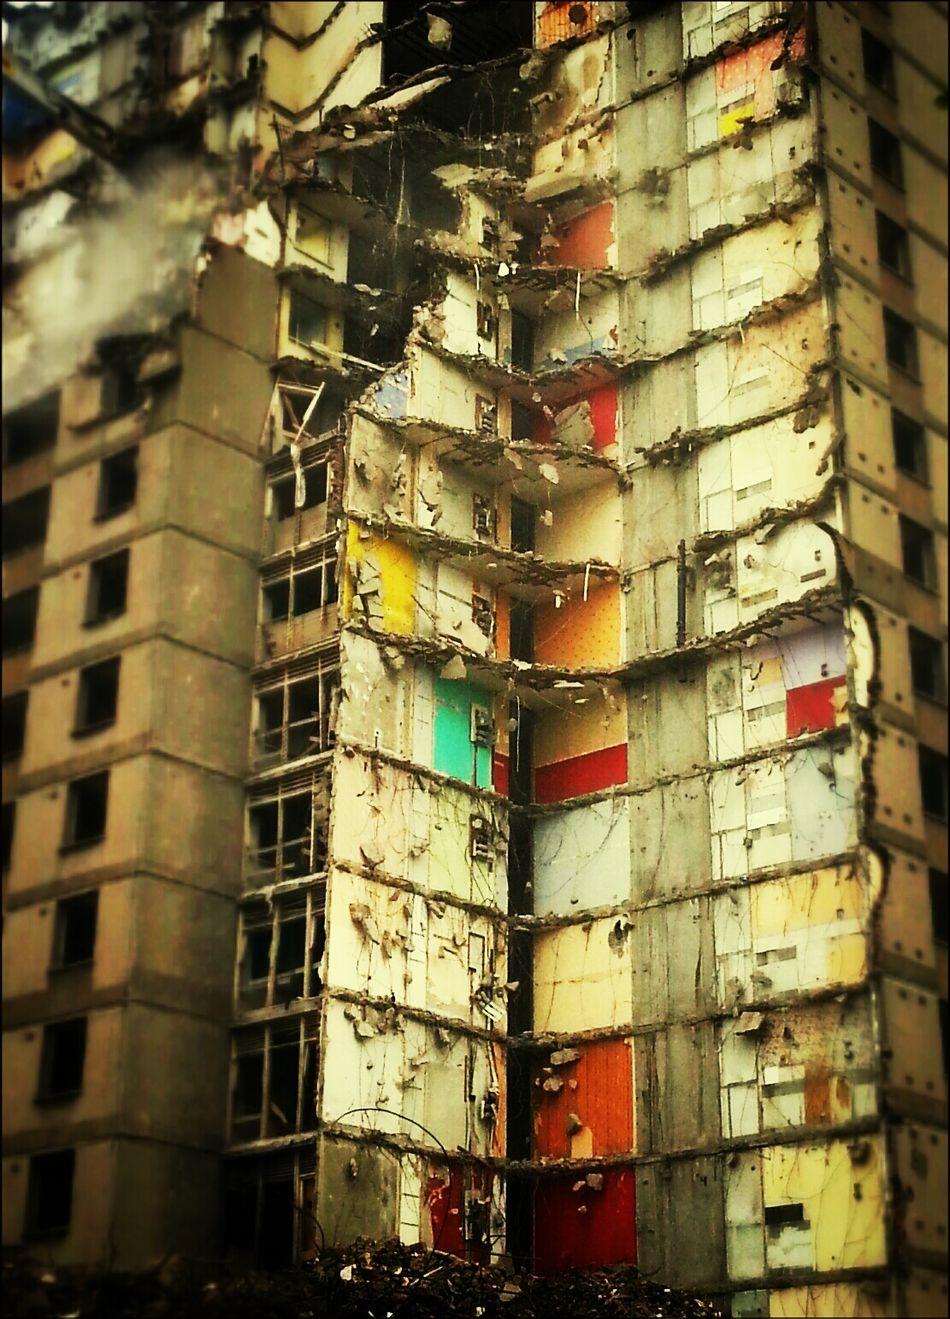 Demolition Exposed